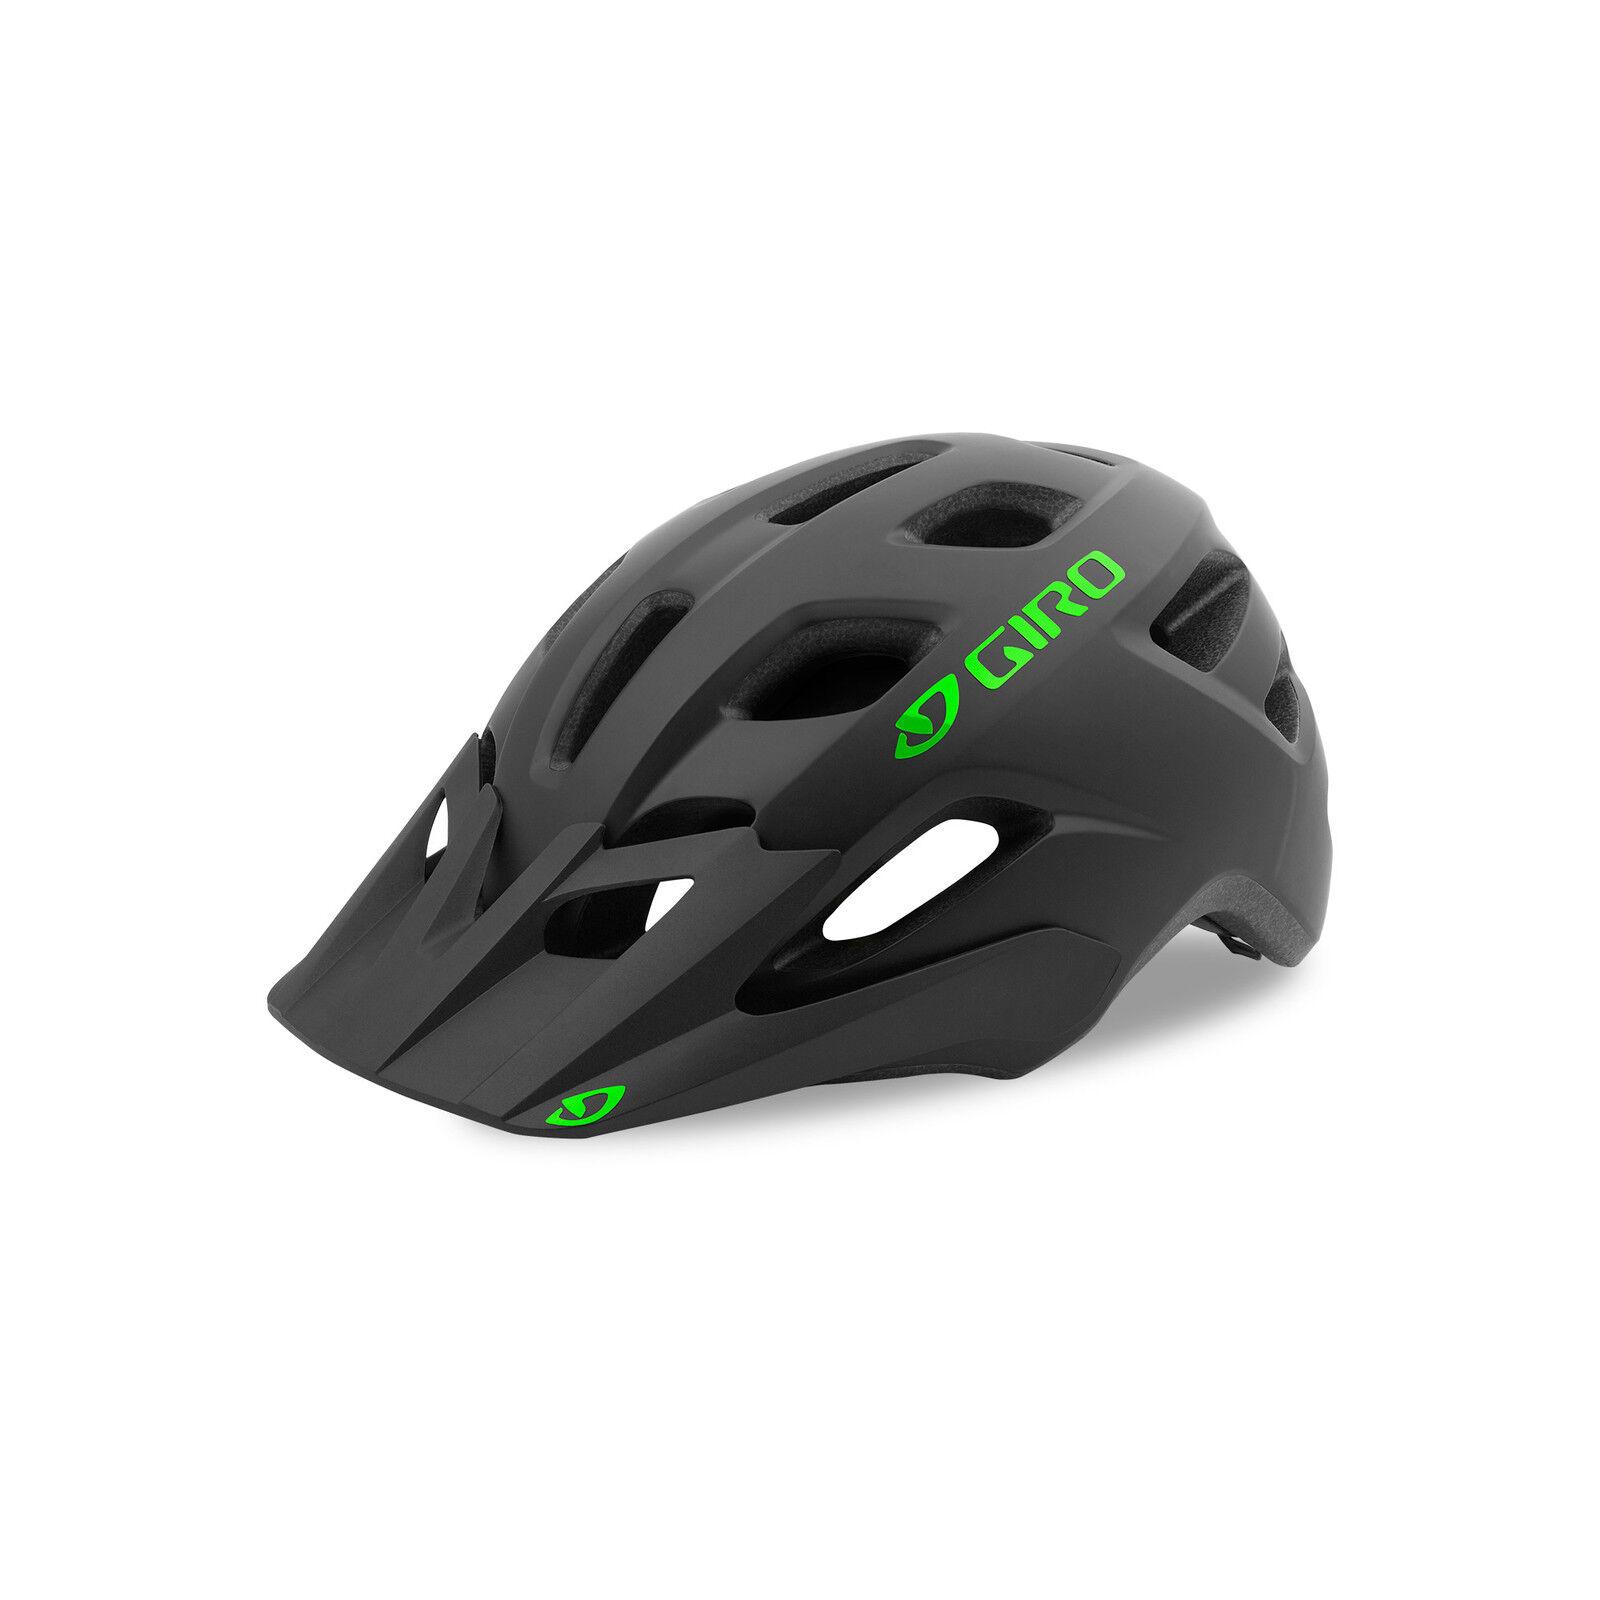 Giro Tremor MIPS Jugend Fahrrad Helm Gr. 50-57cm black 2019